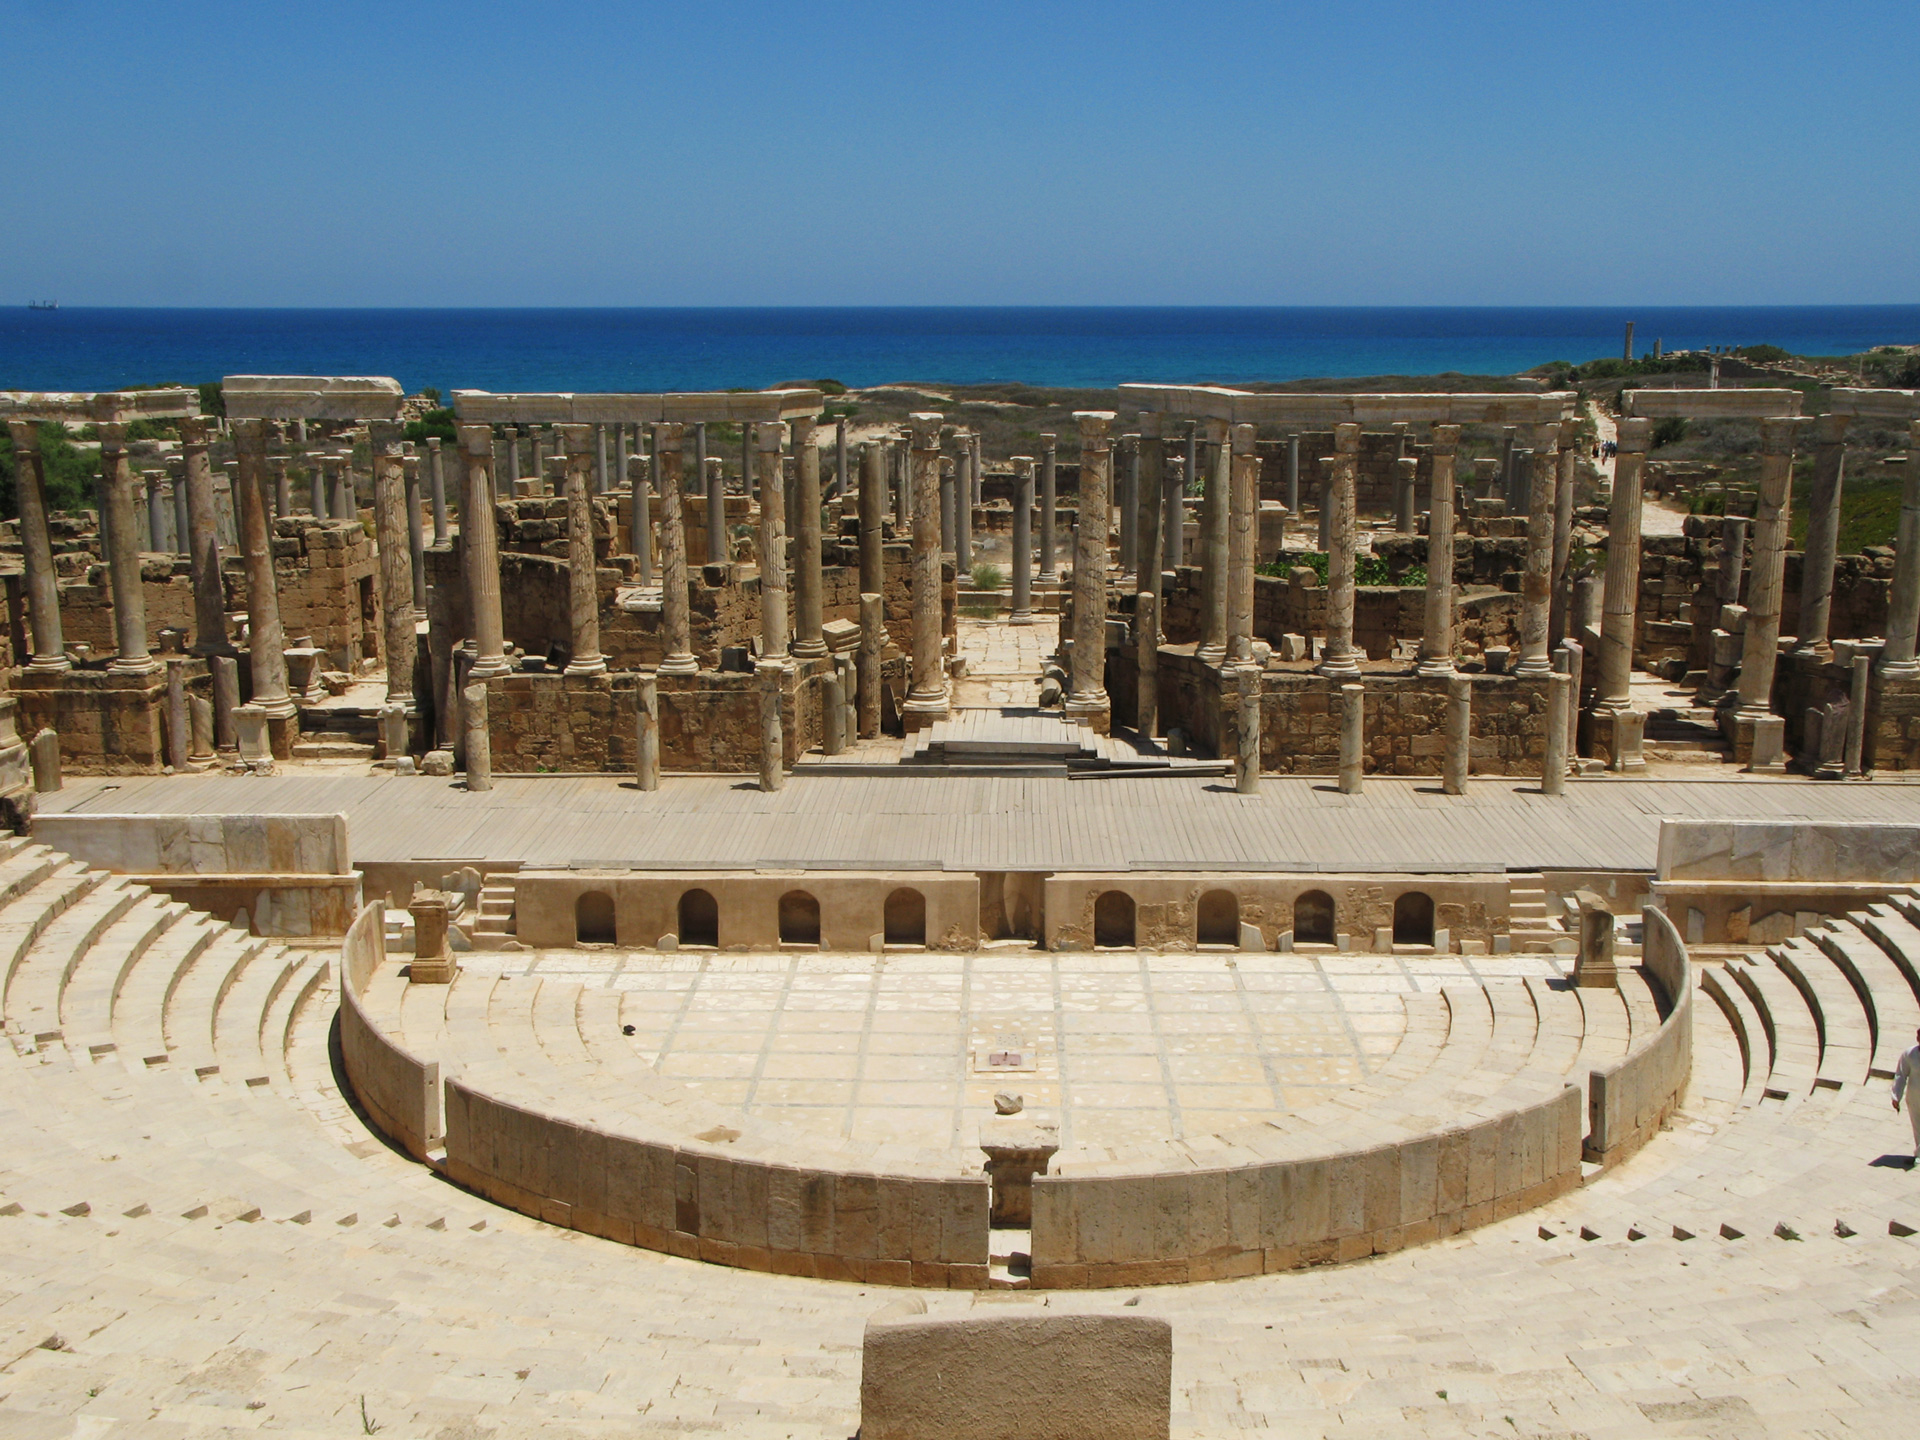 Amphitheatre, view North to the Mediterranean.